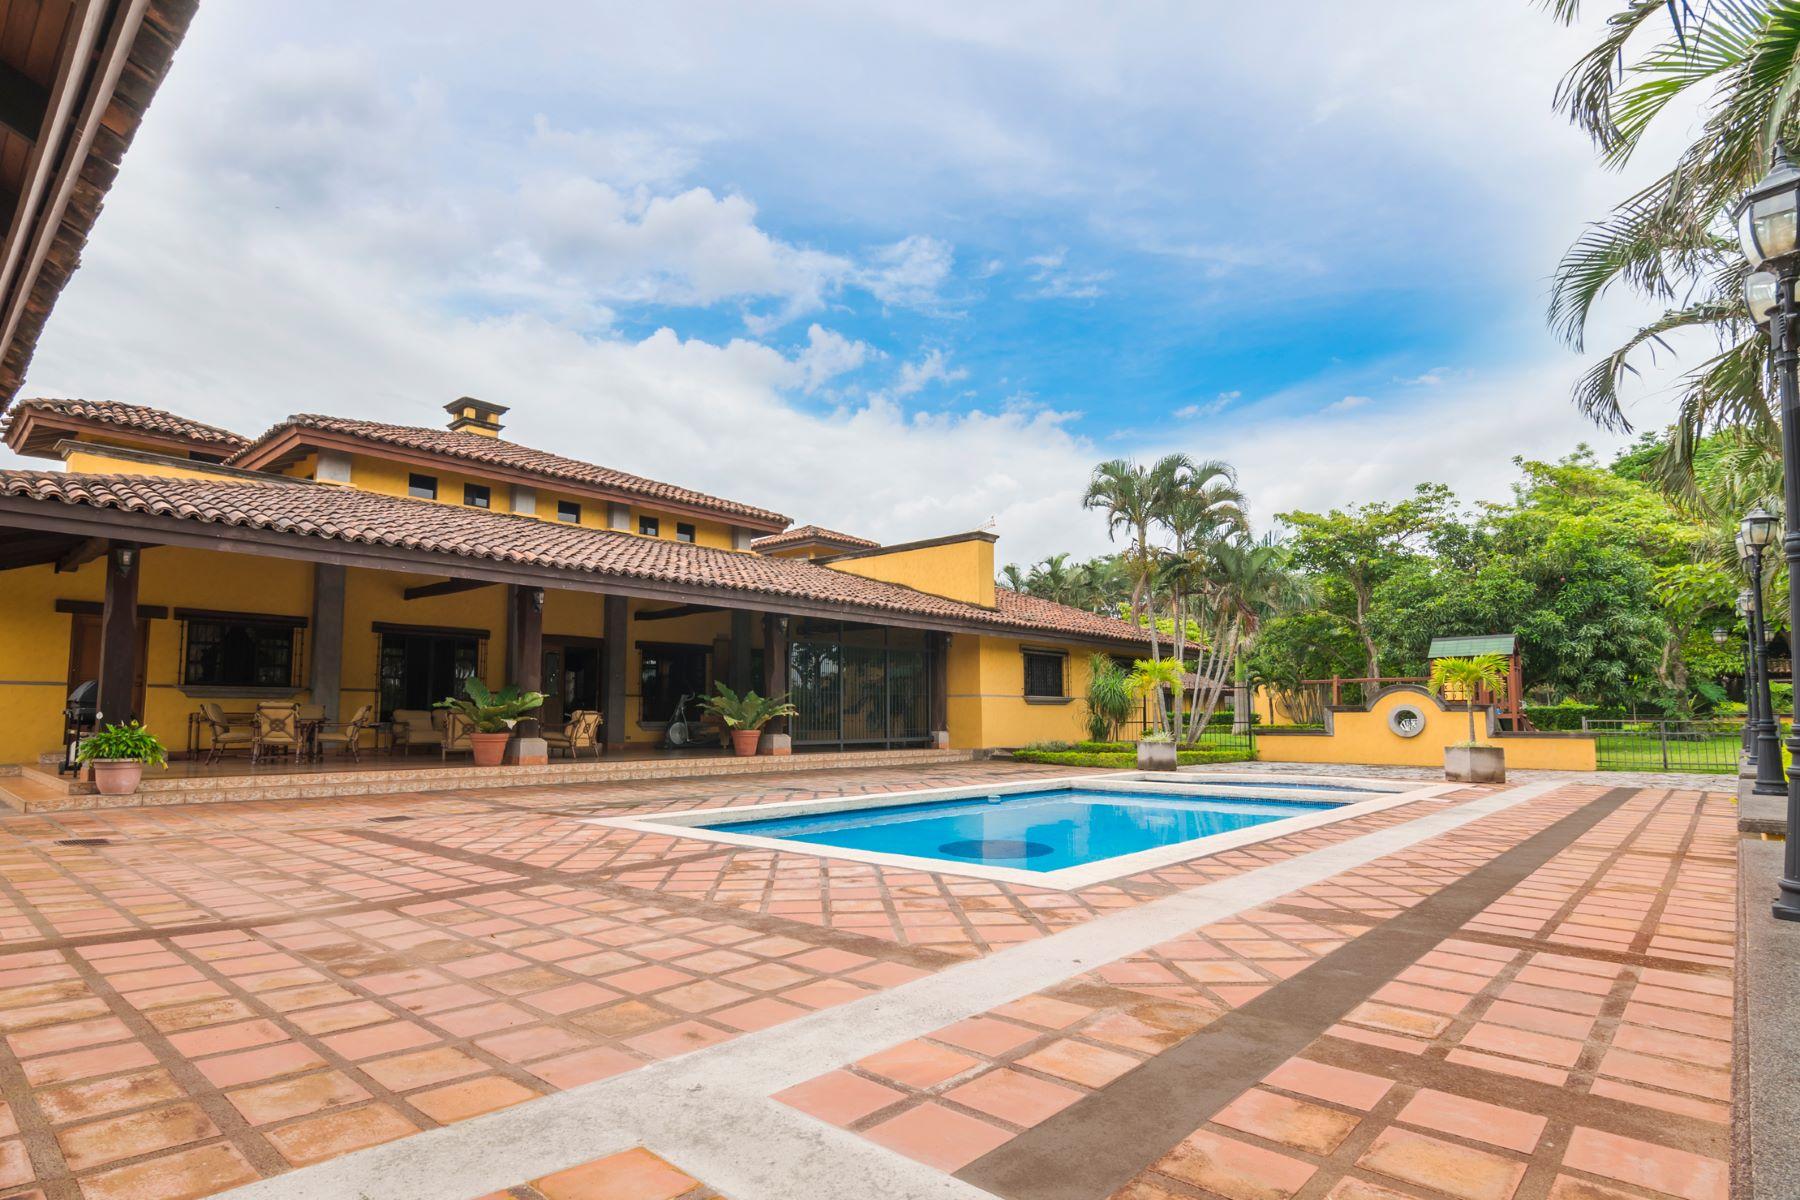 Hacienda and Estancia Homes για την Πώληση στο Casa Premier Polo Other Alajuela, Αλαχουελα Κόστα Ρίκα